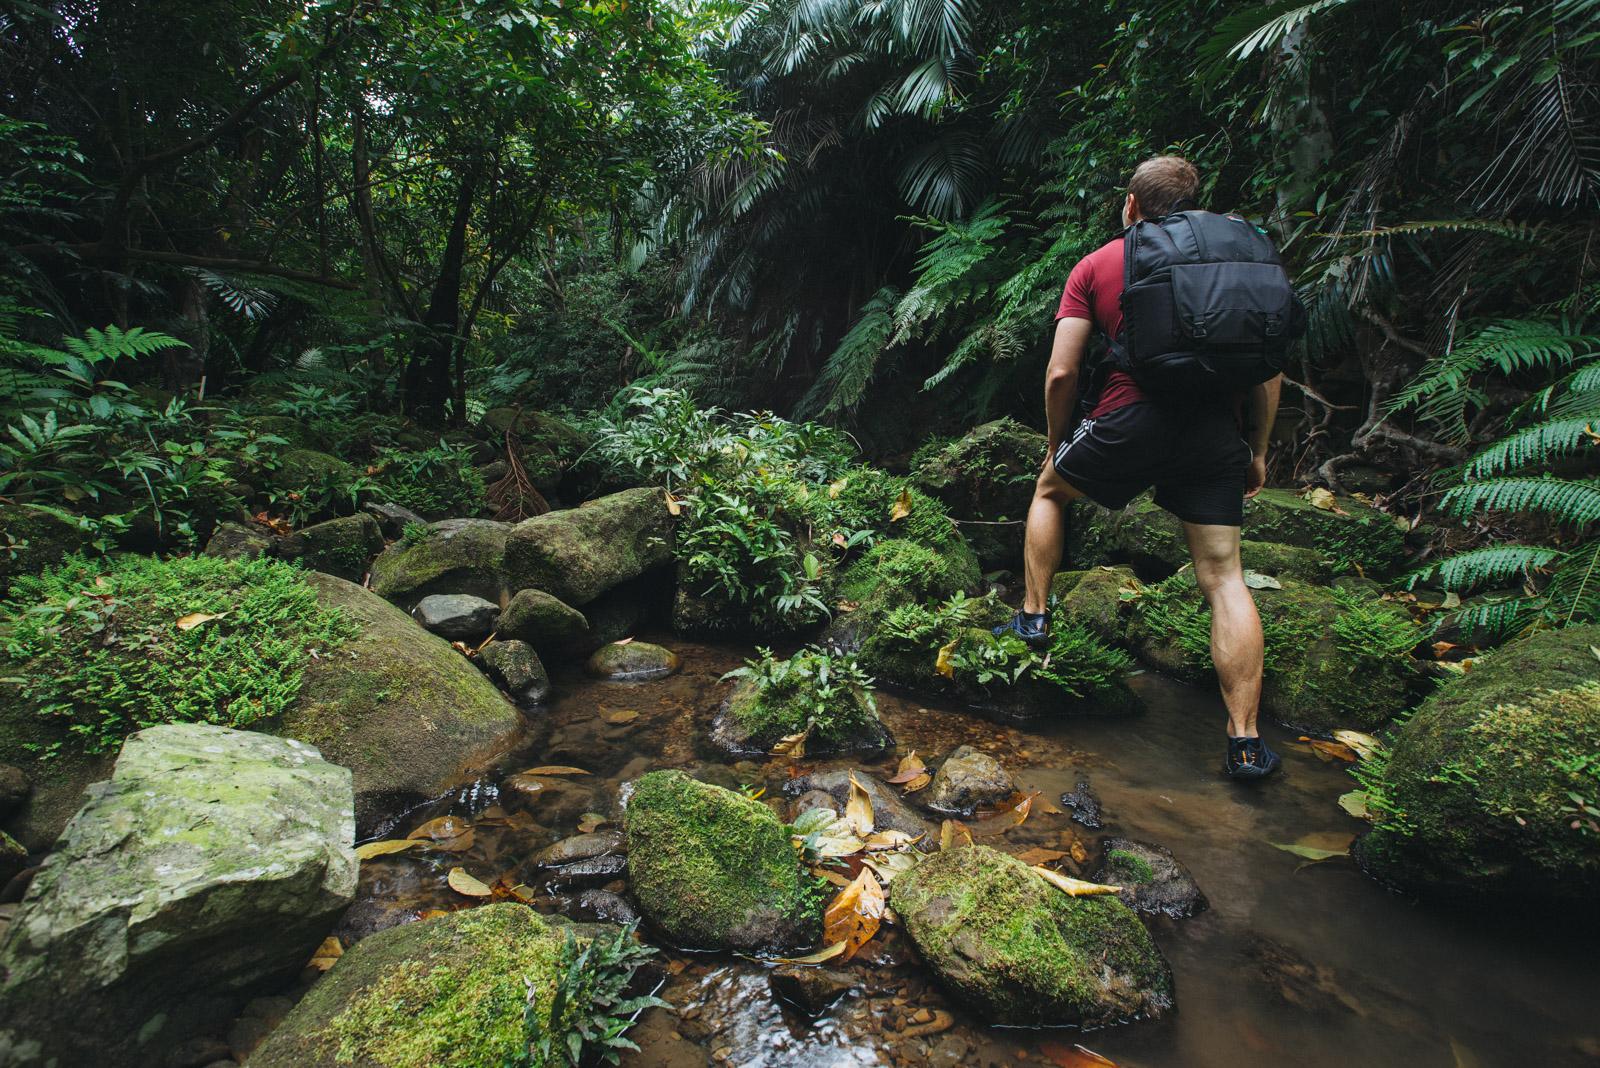 Stream trekking through the lush green Jungle of Iriomote Island, Okinawa, Japan.